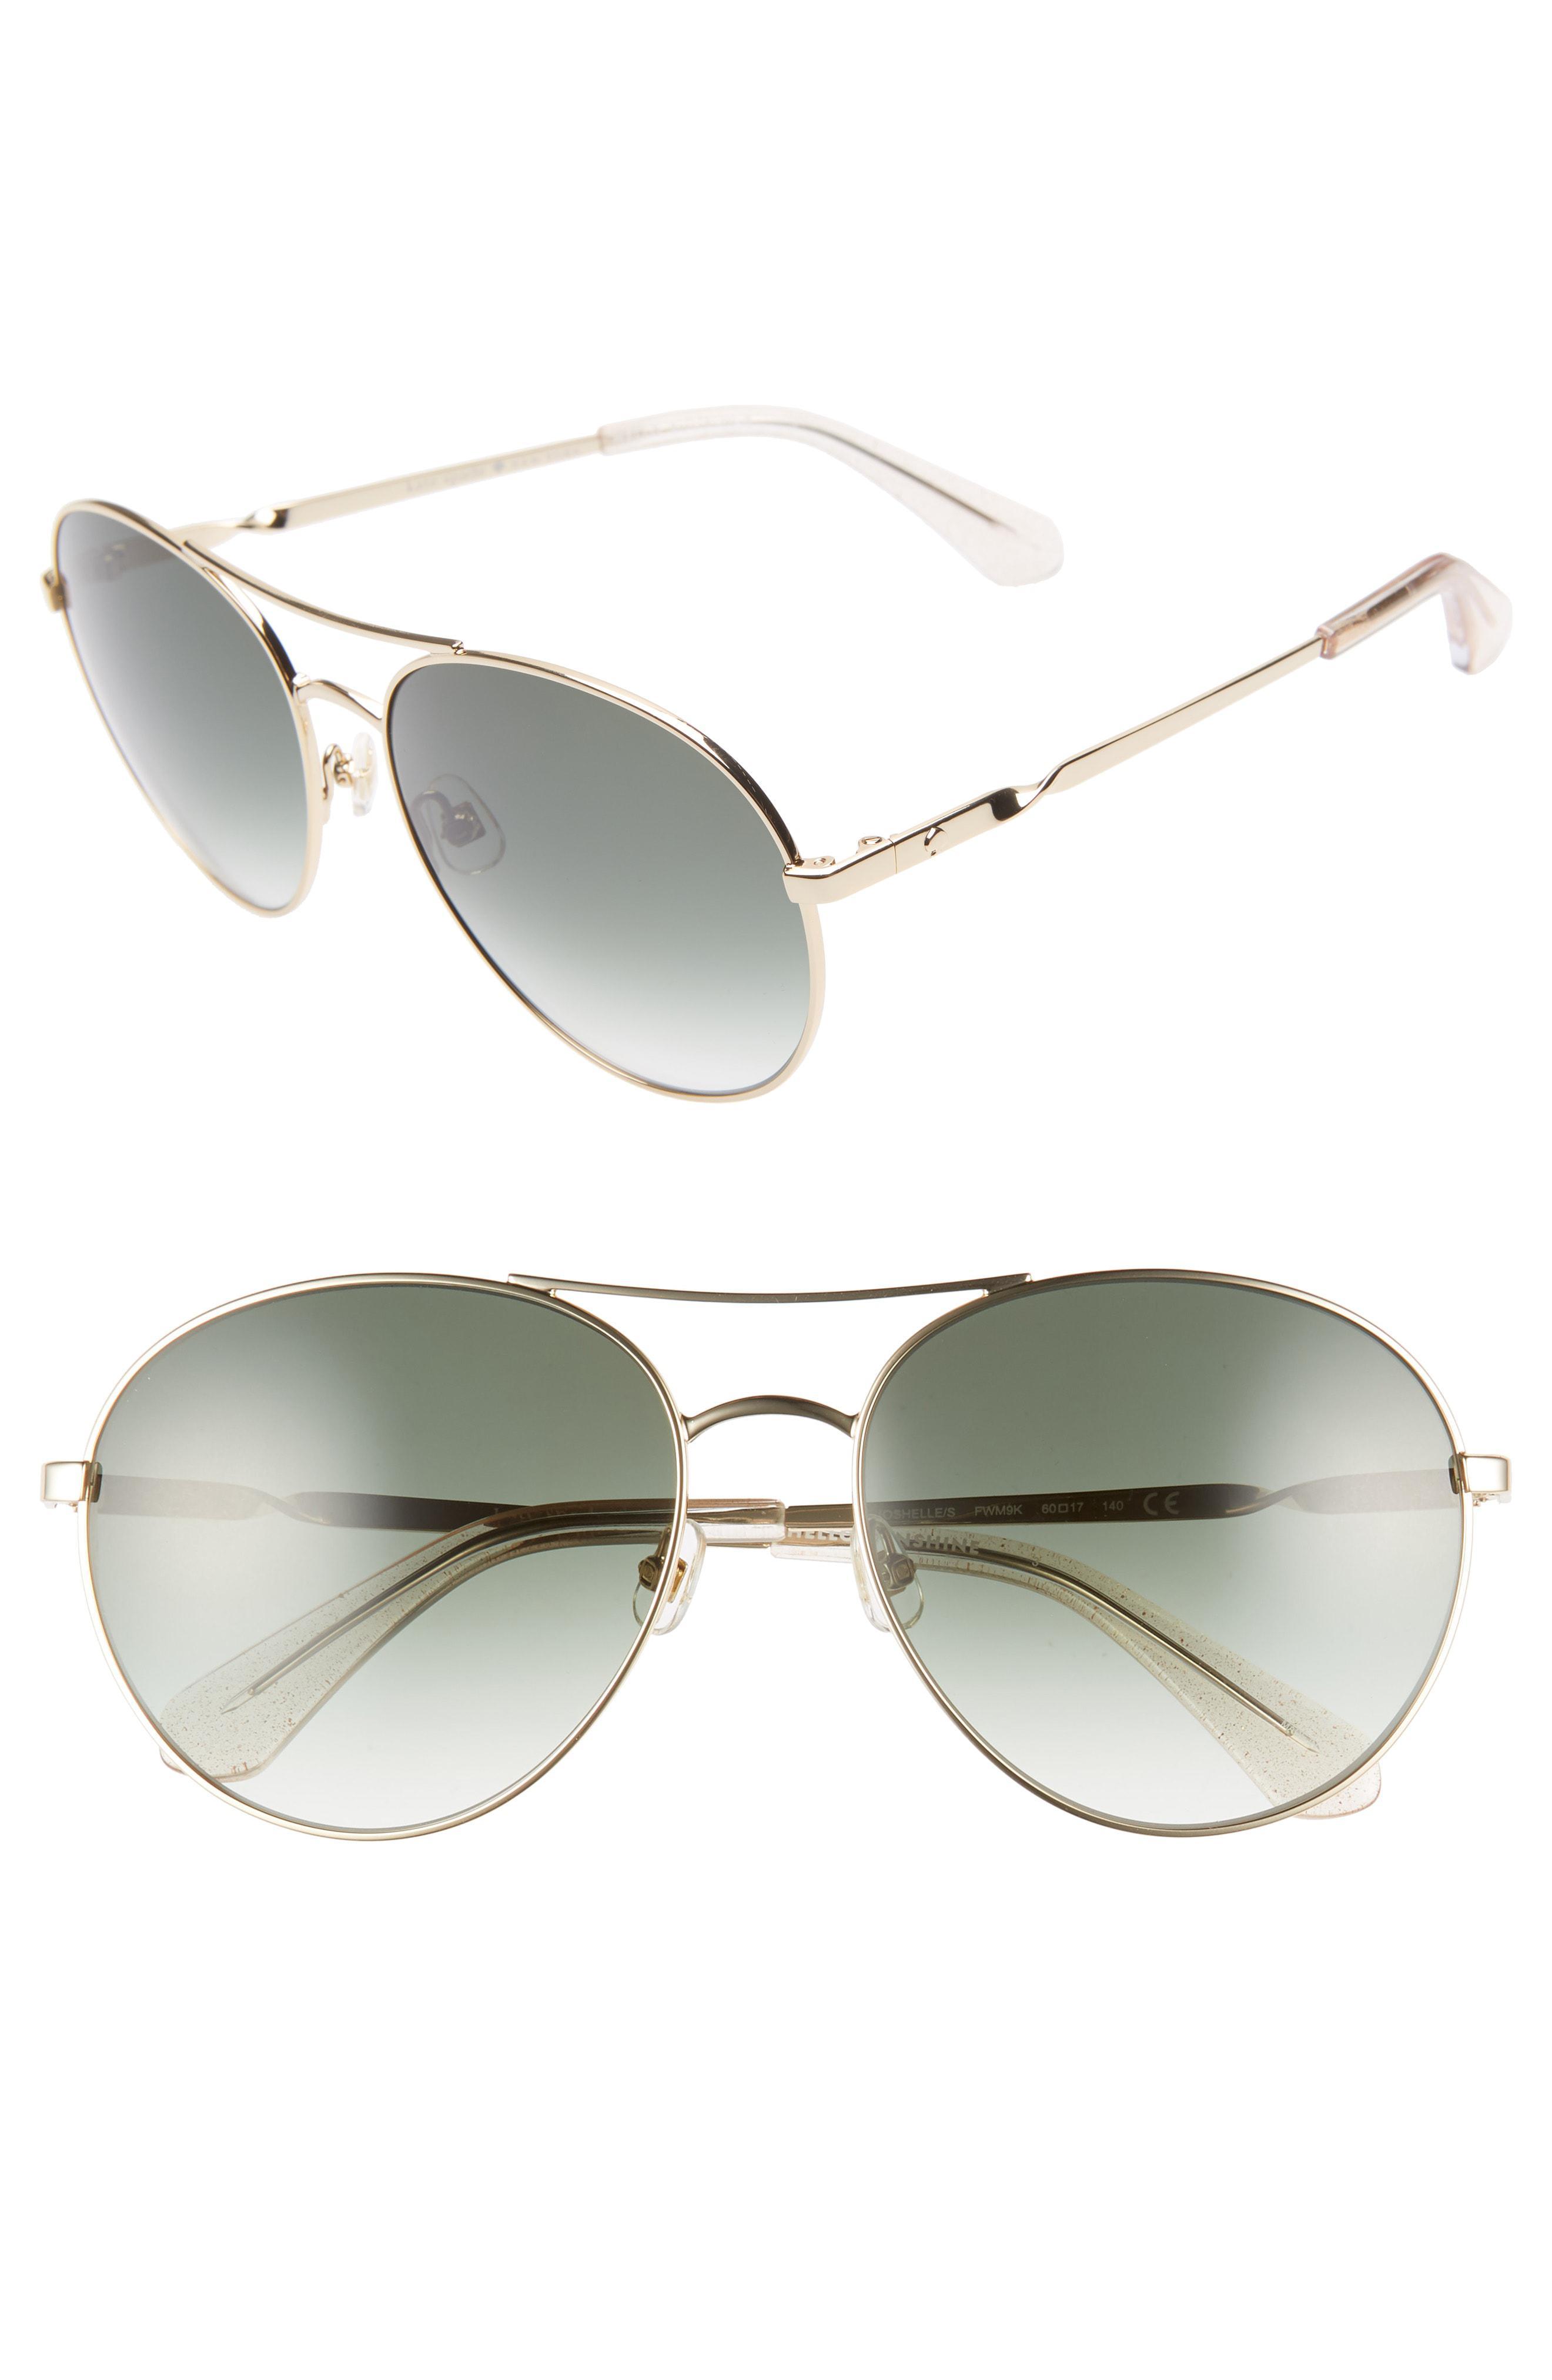 552dc7de8ab4b Lyst - Kate Spade Joshelle 60mm Aviator Sunglasses - in Pink